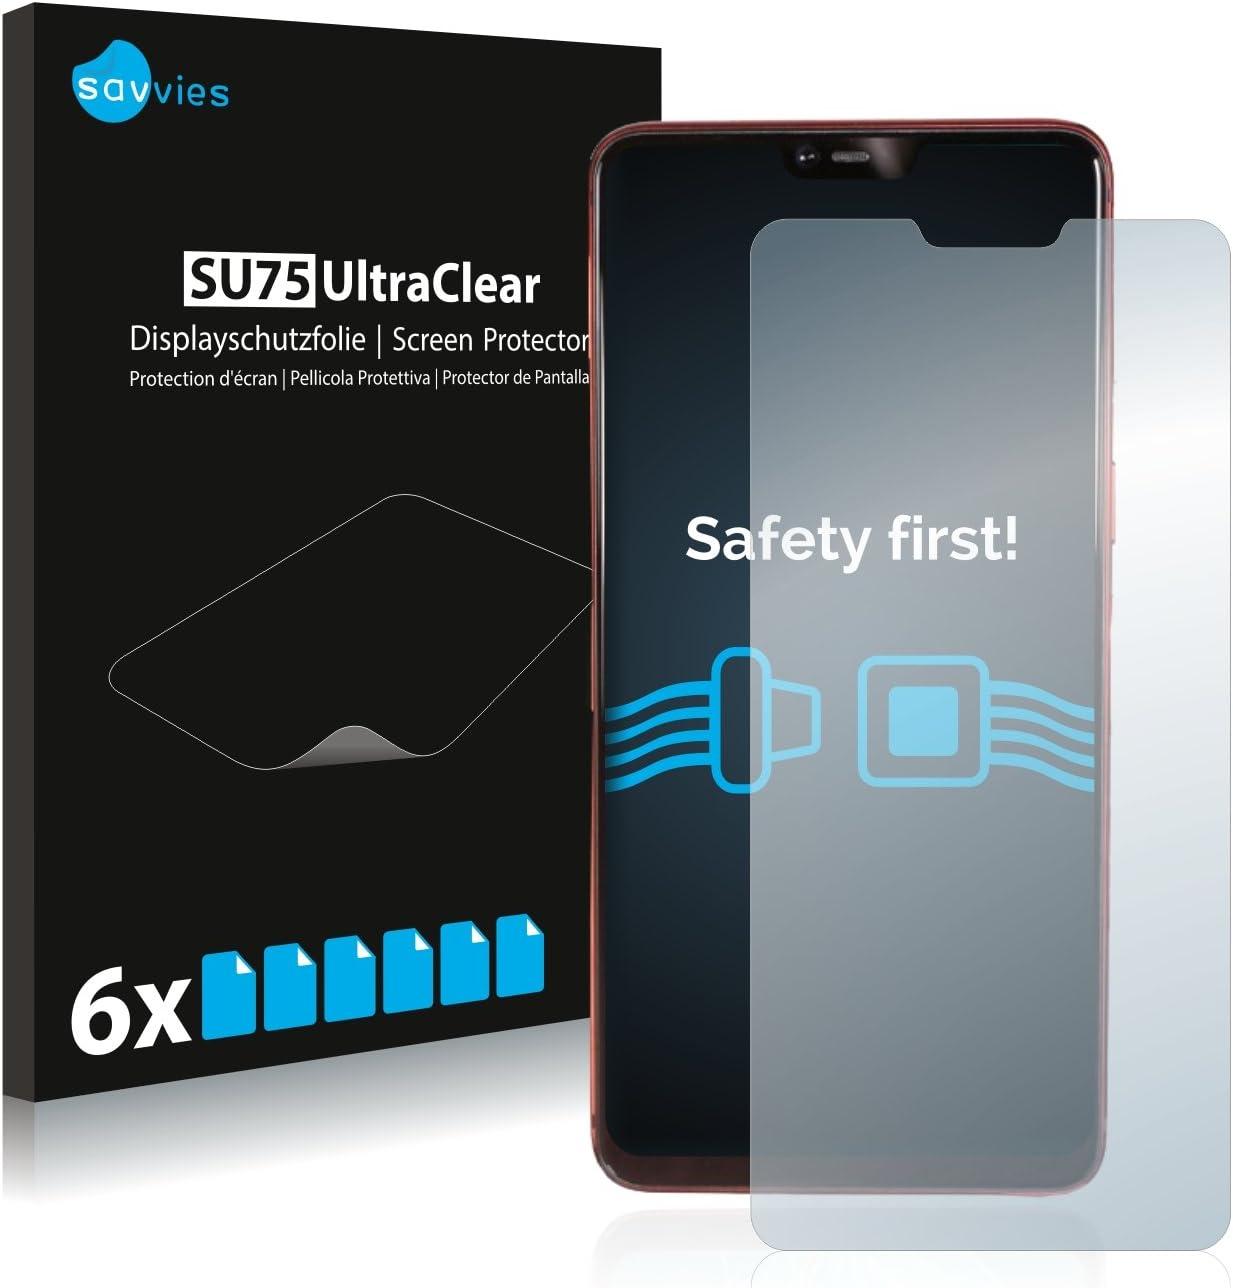 savvies Protector Pantalla Compatible con OPPO R15 Pro (6 Unidades) Pelicula Ultra Transparente: Amazon.es: Electrónica